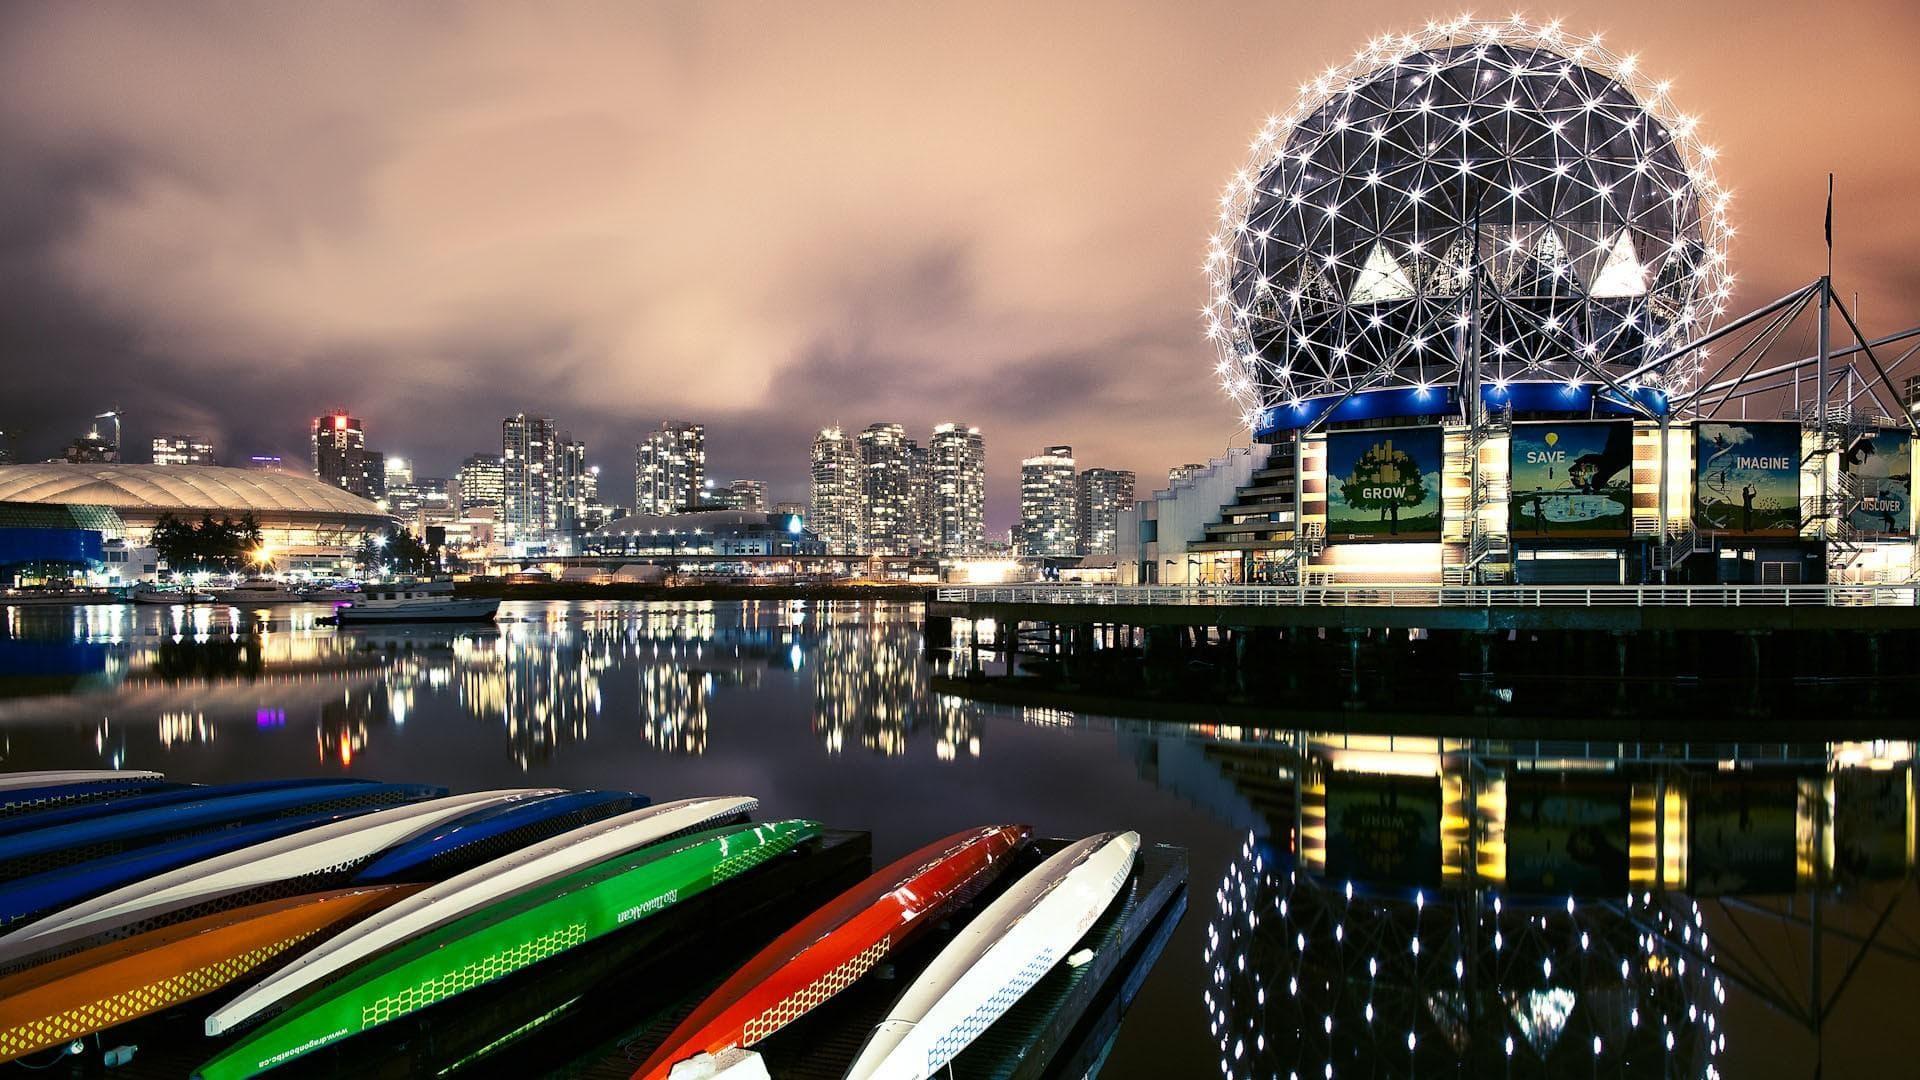 Vancouver Hd Wallpapers 7wallpapersnet